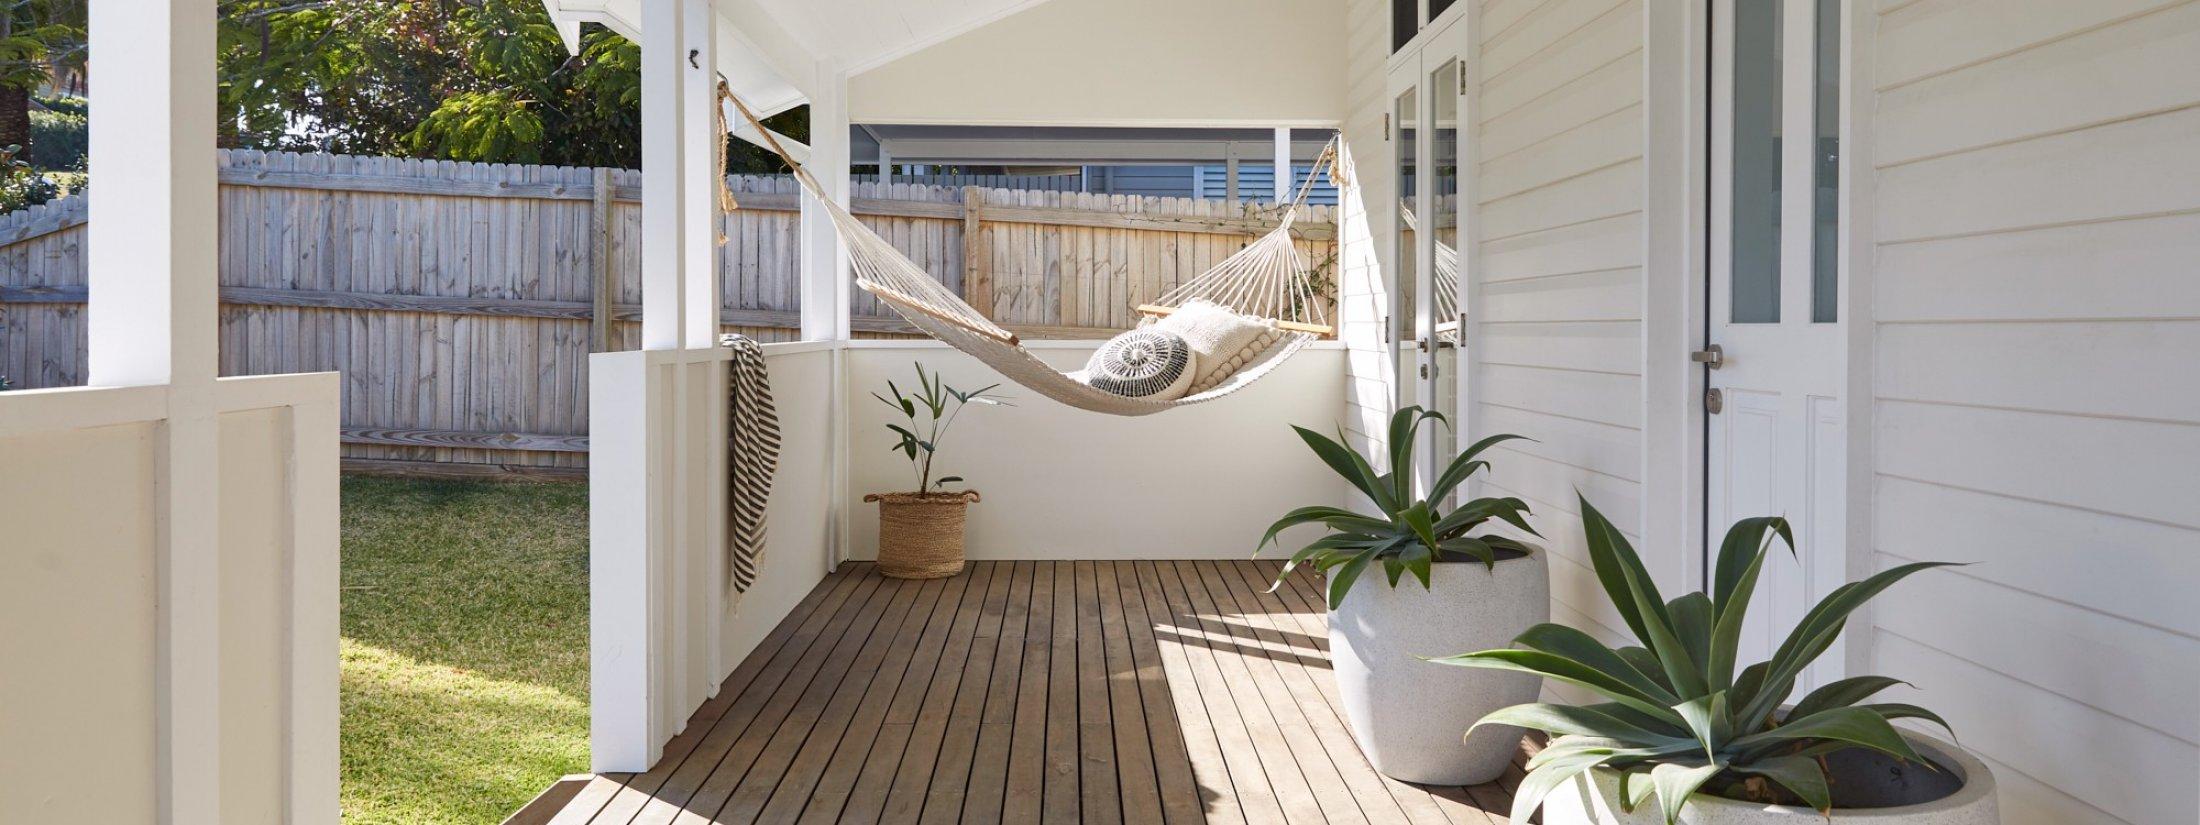 Belletide - Byron Bay - Outdoor hammock